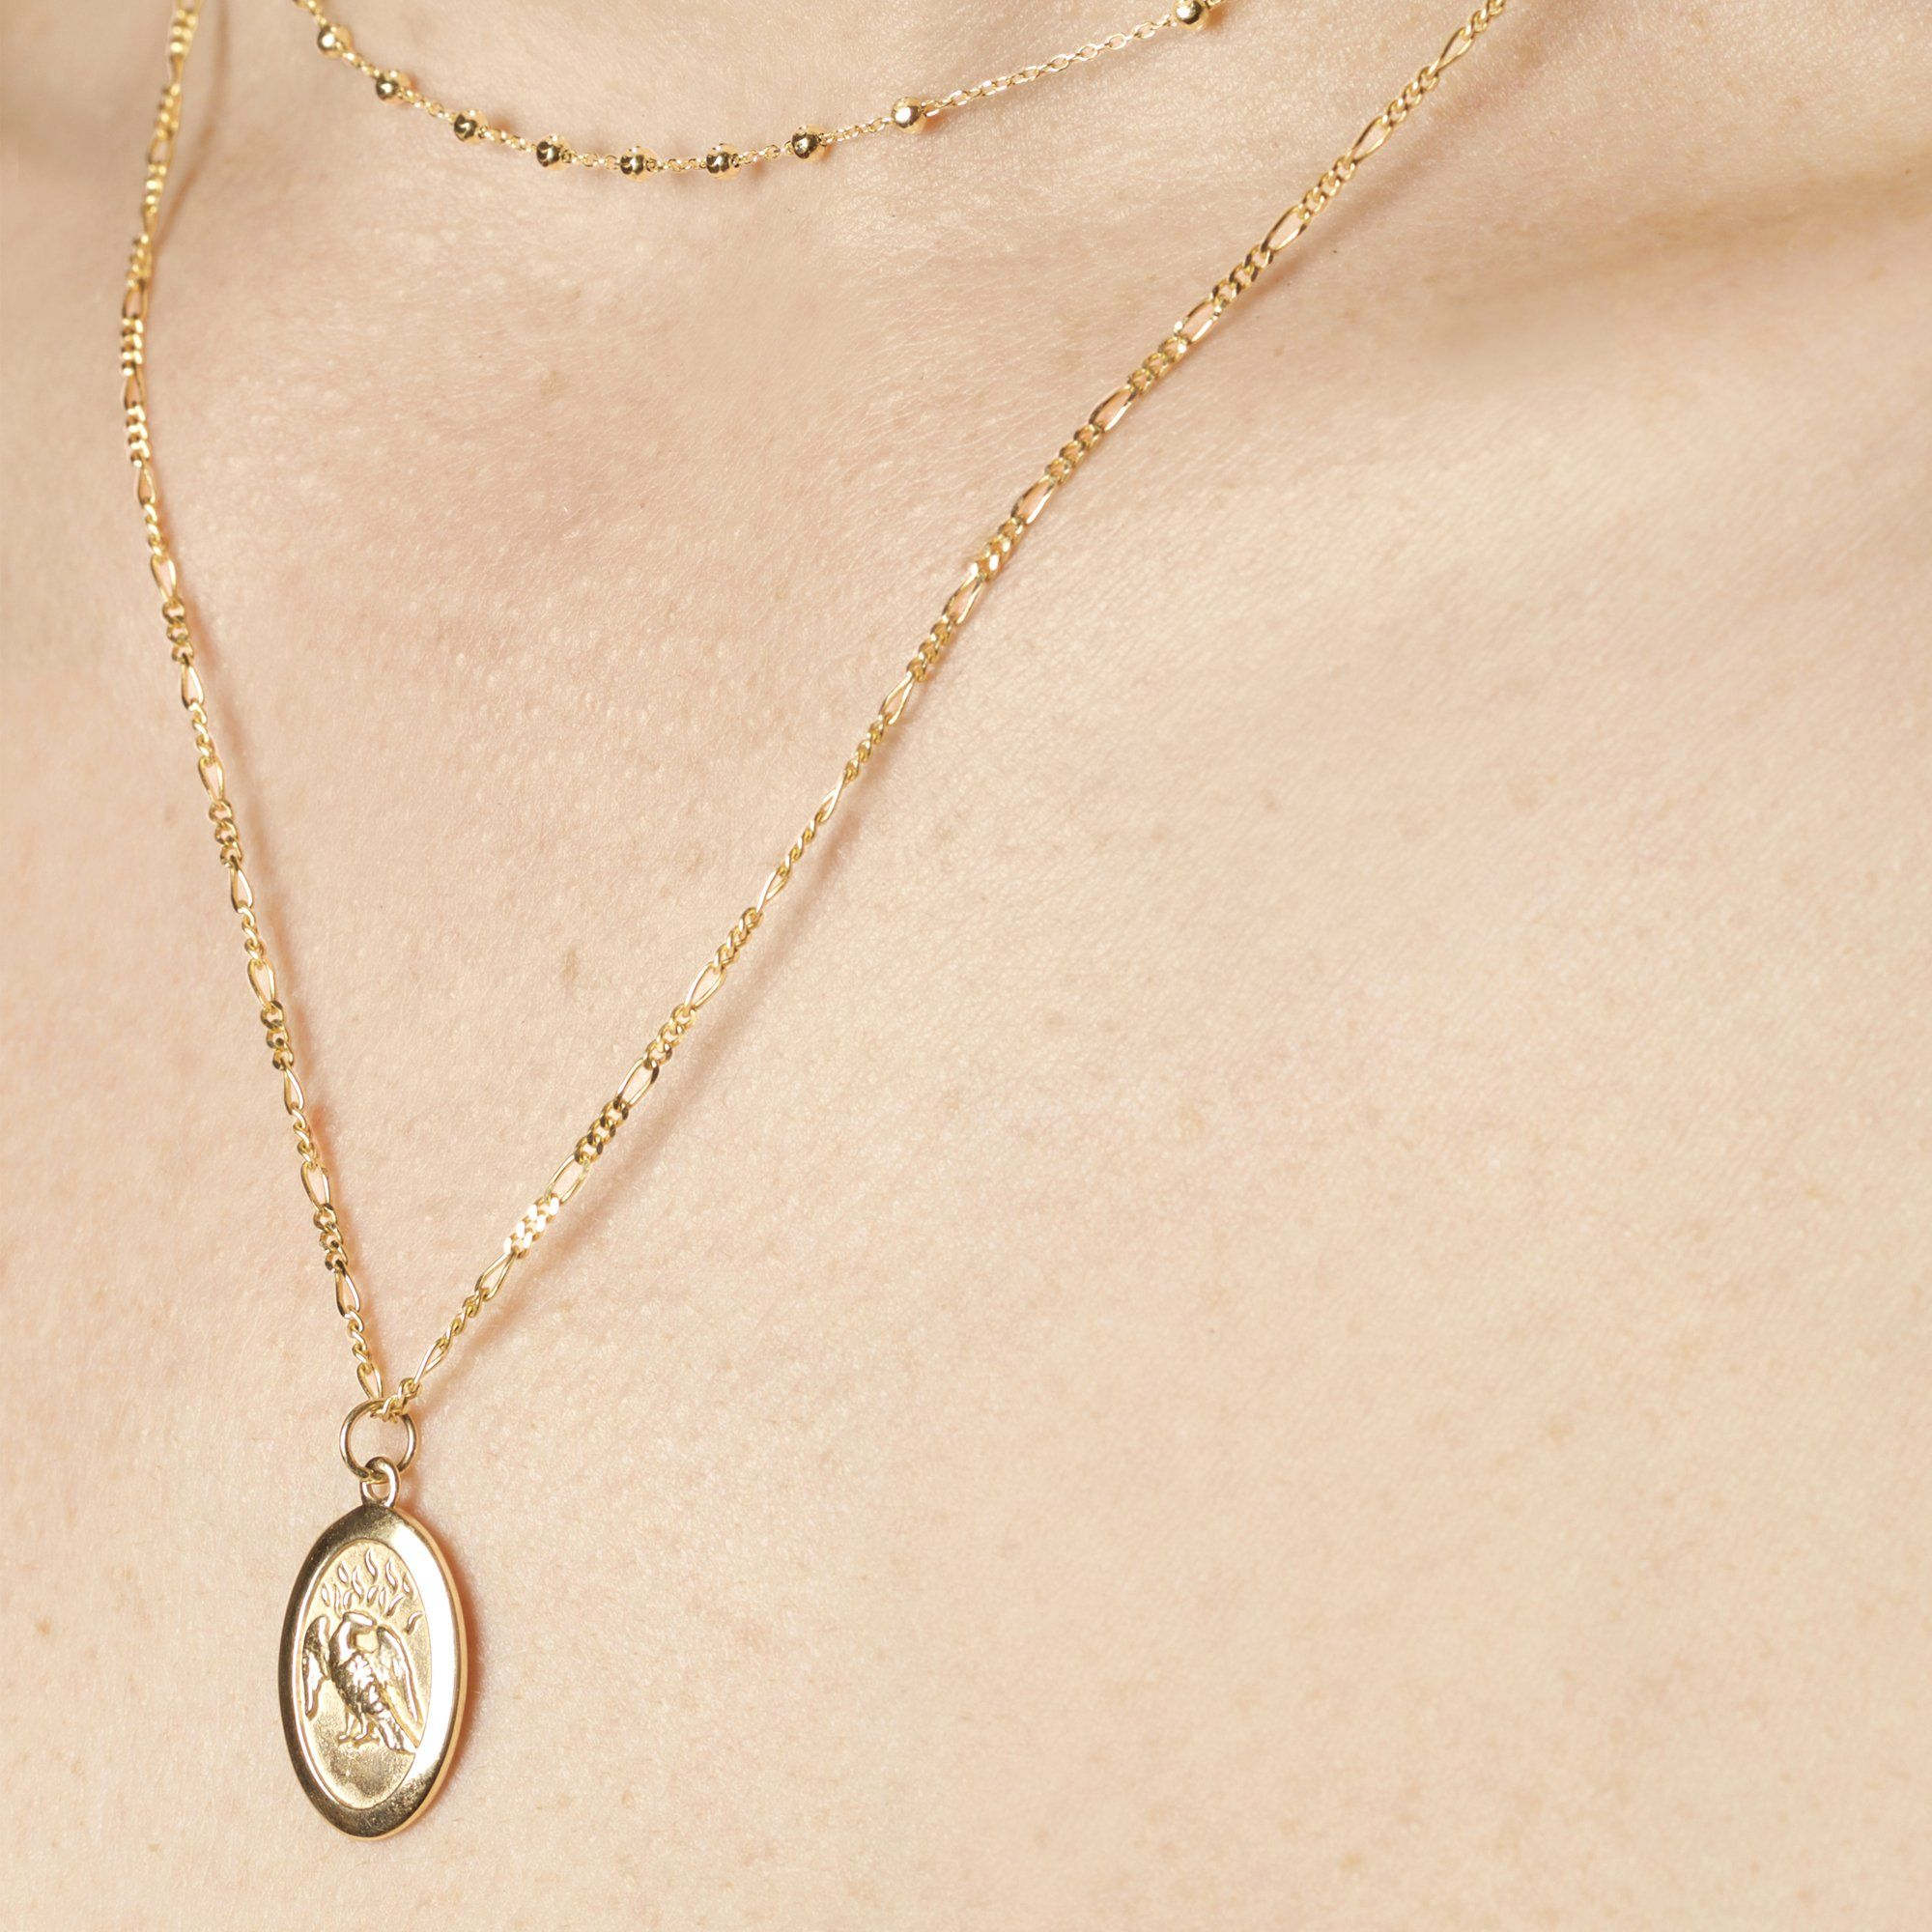 Phoenix Amulet Necklace Phoenix Jewelry White Gold Jewelry Phoenix Necklace